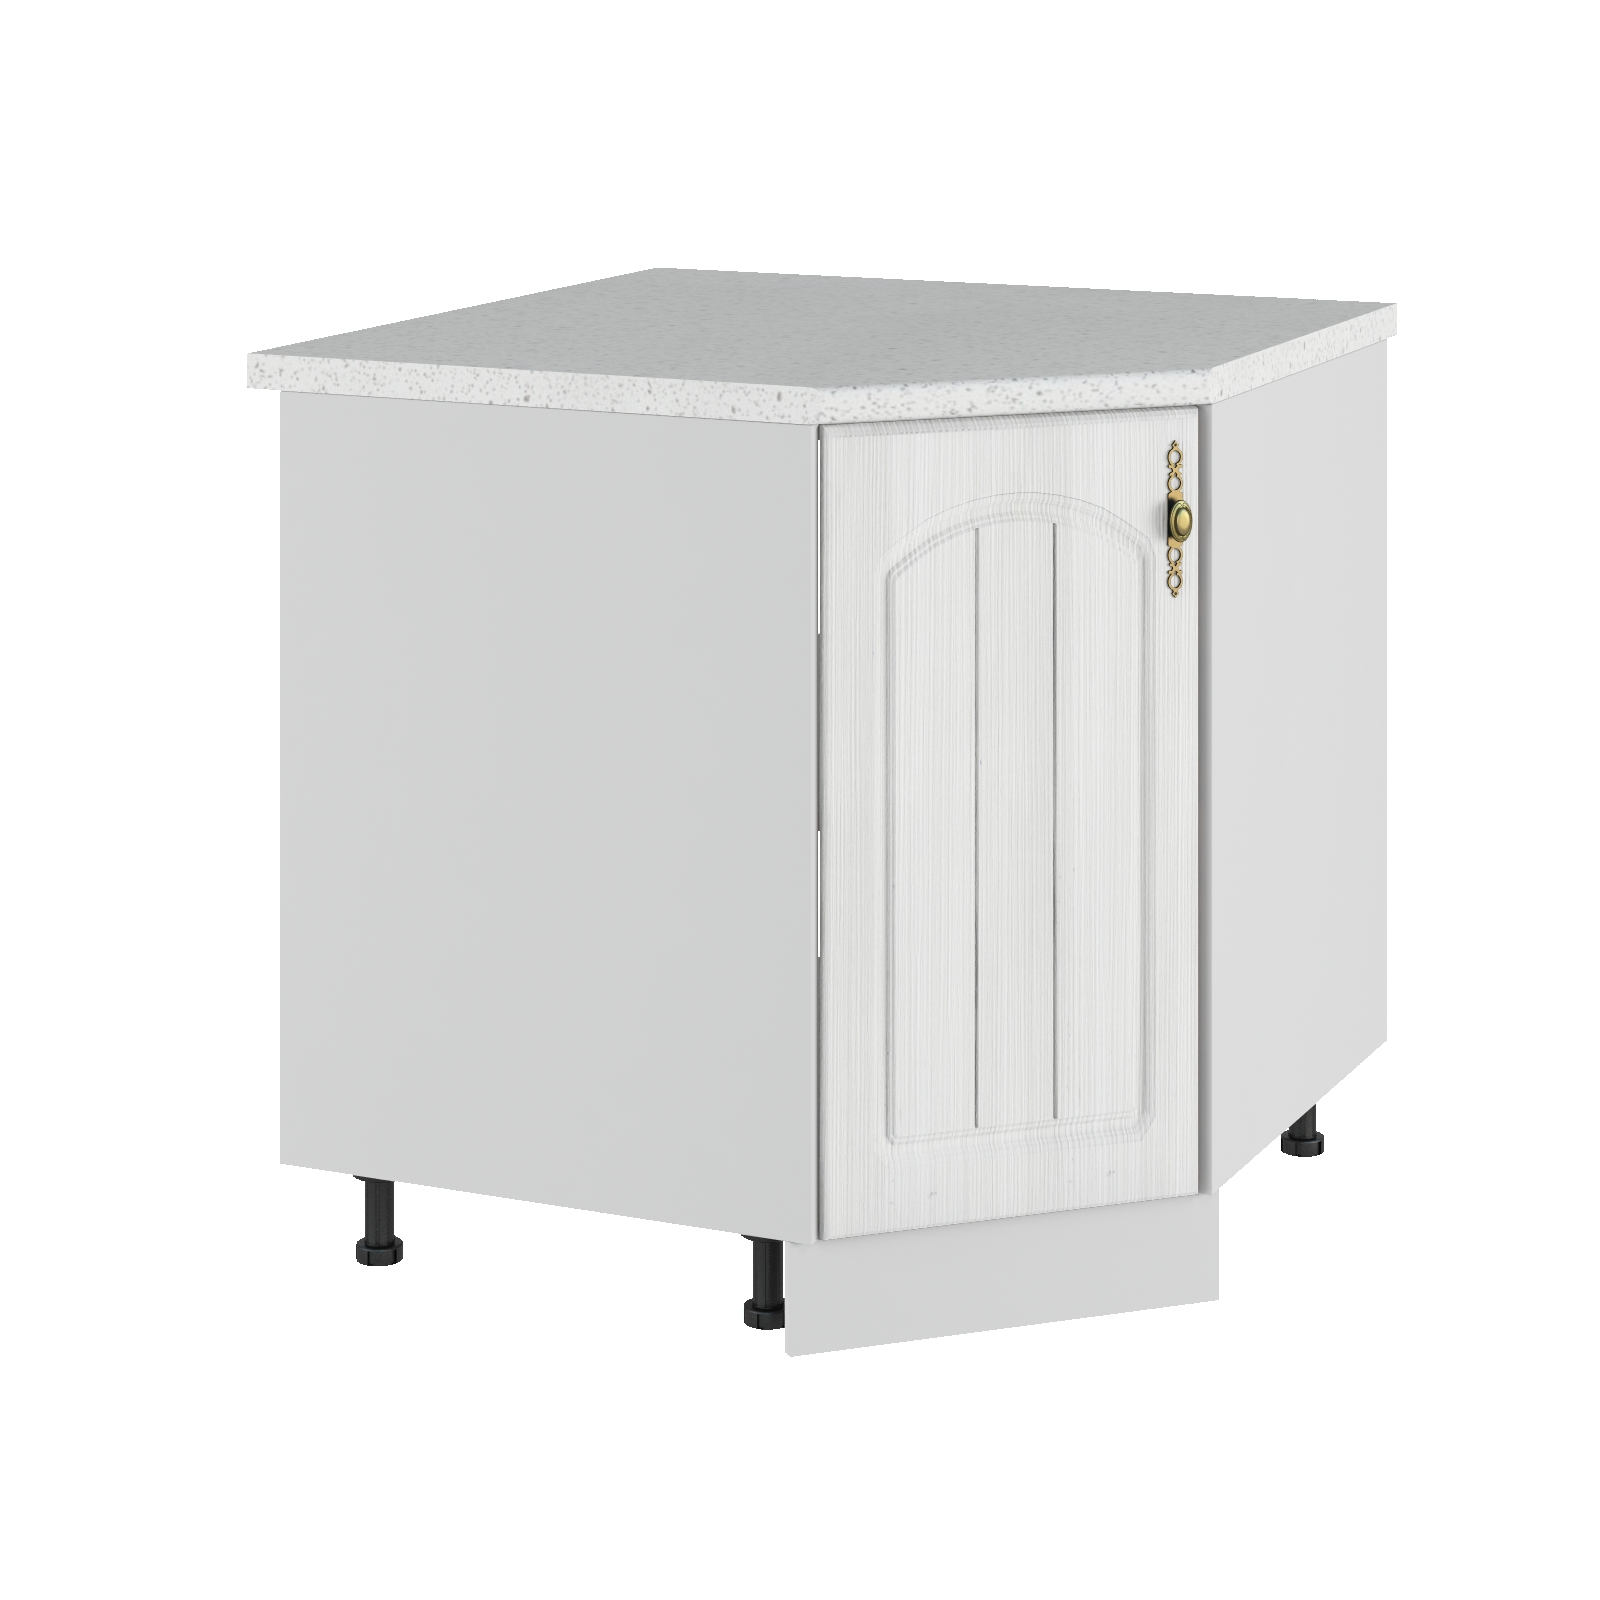 Кухня Монако СУ 850*850 Шкаф нижний угловой правый